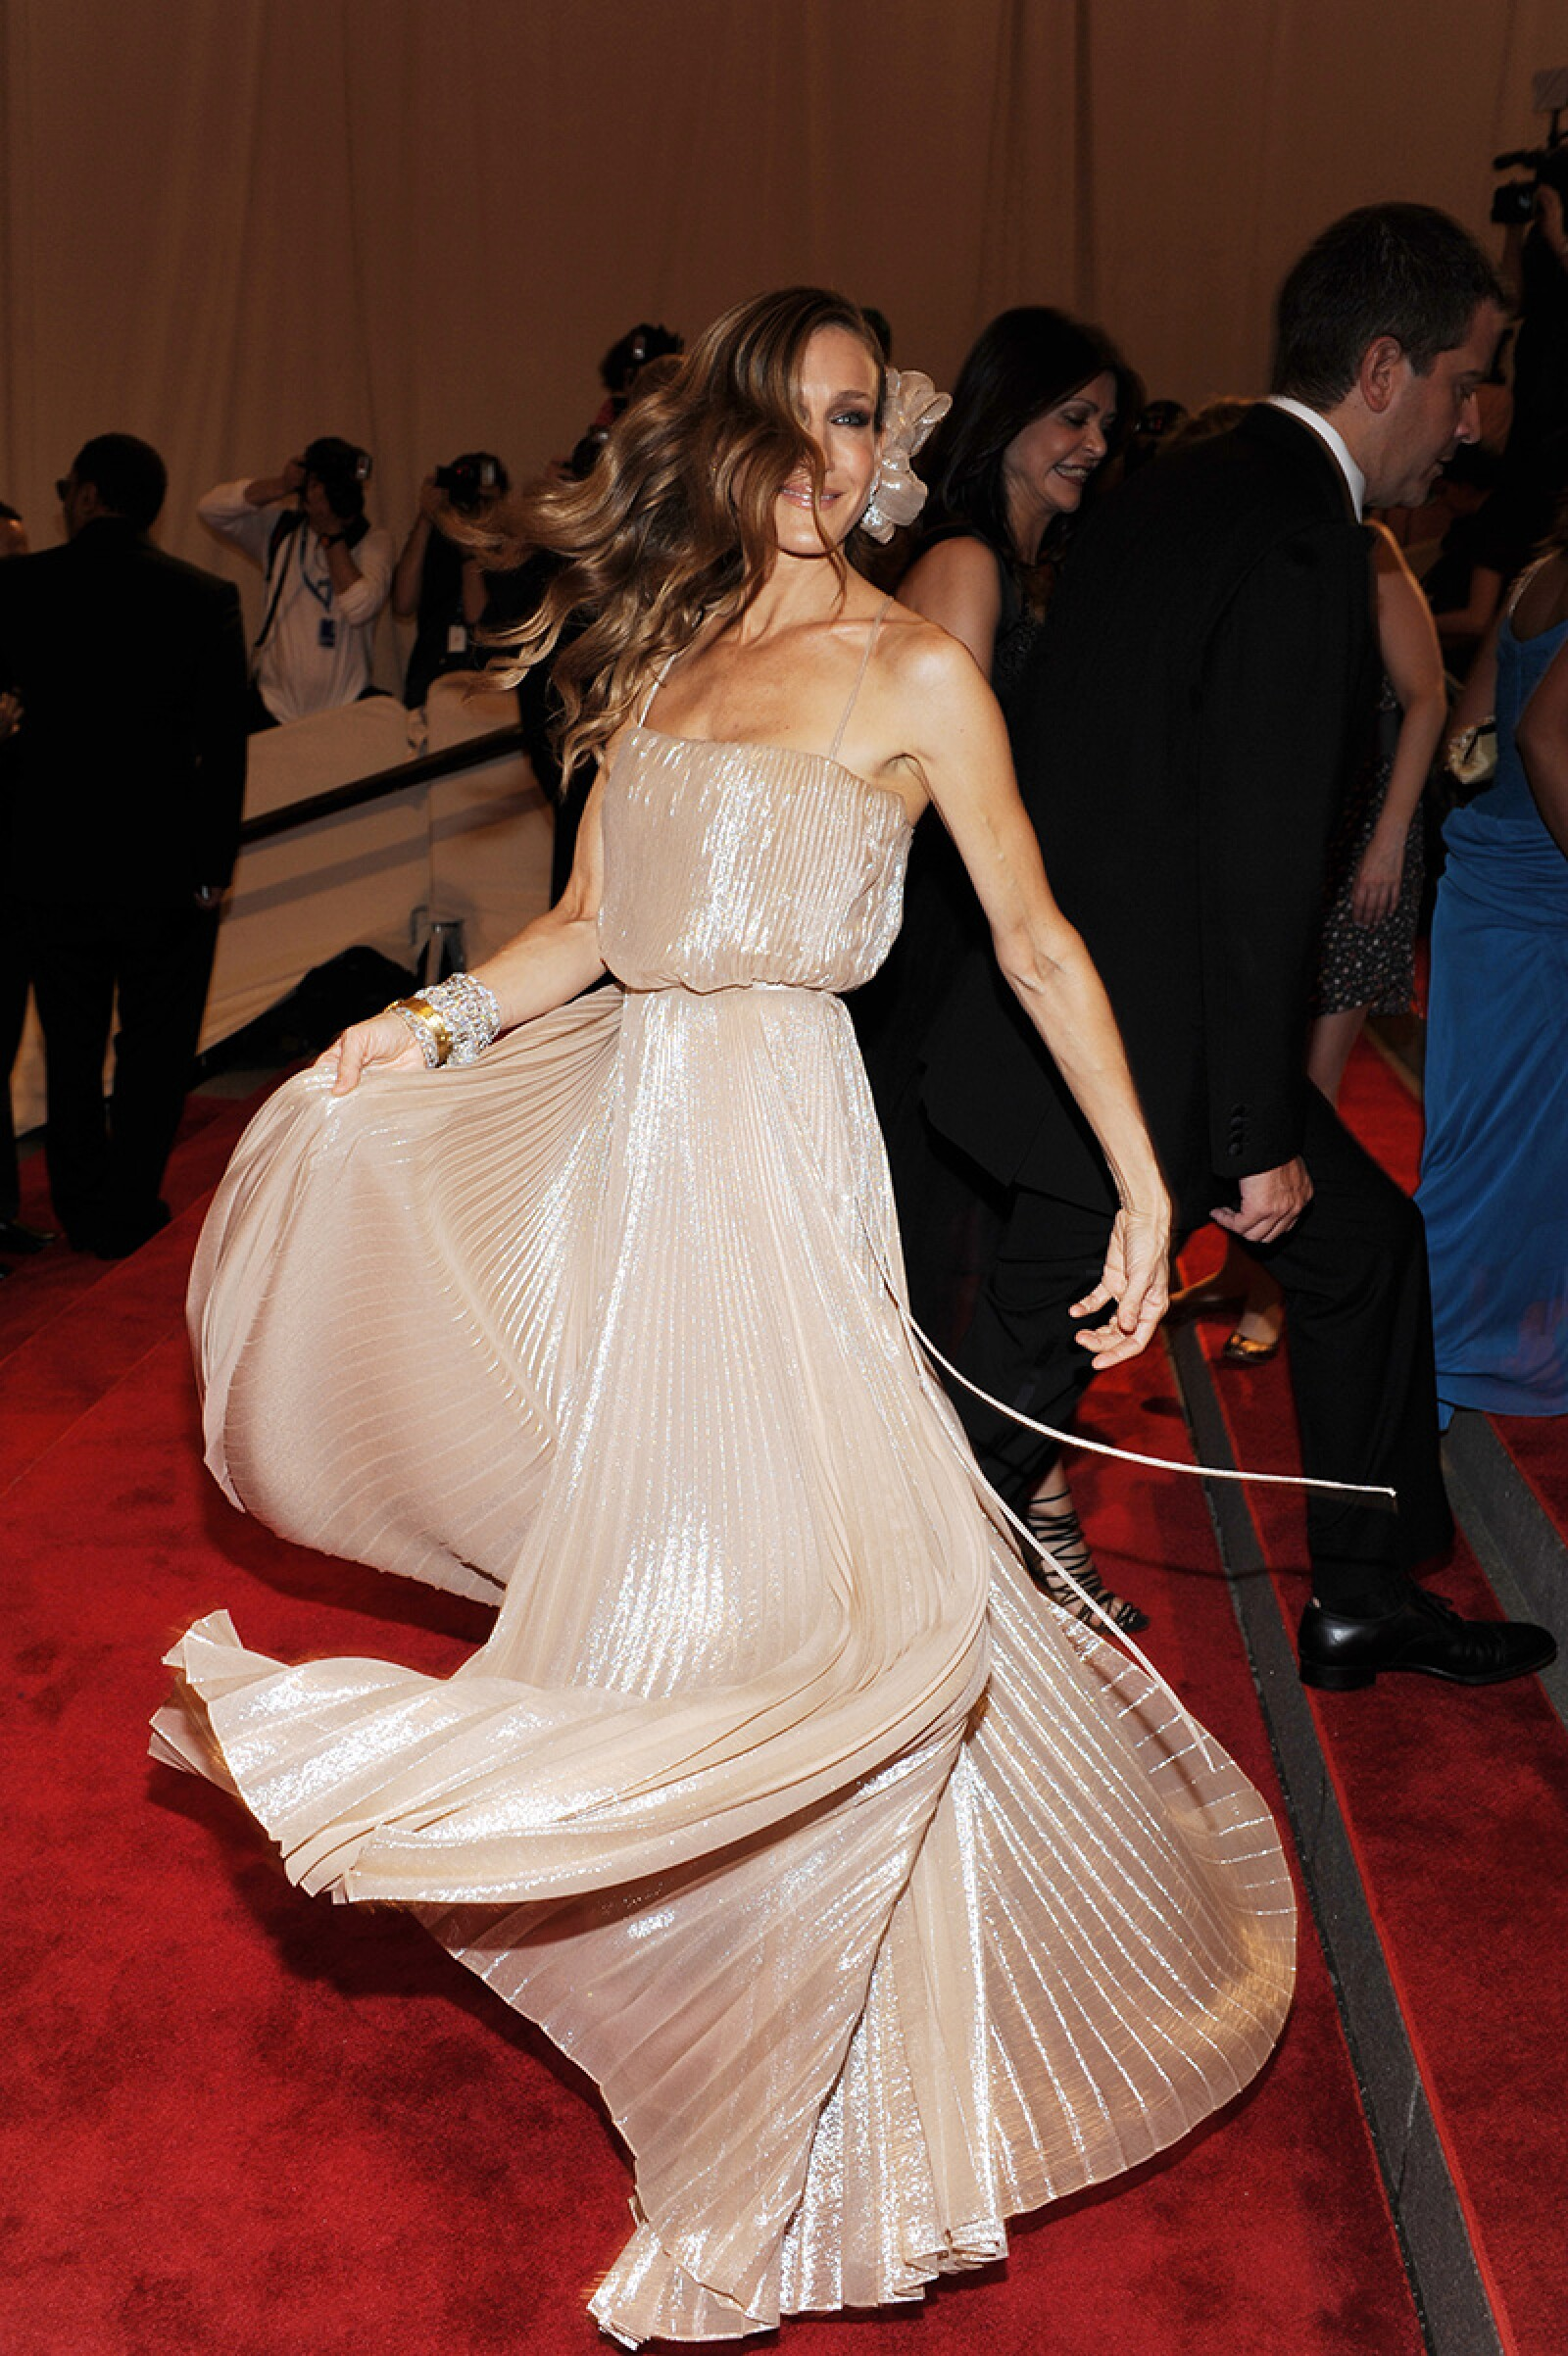 2010 Met Costume Institute Gala, New York